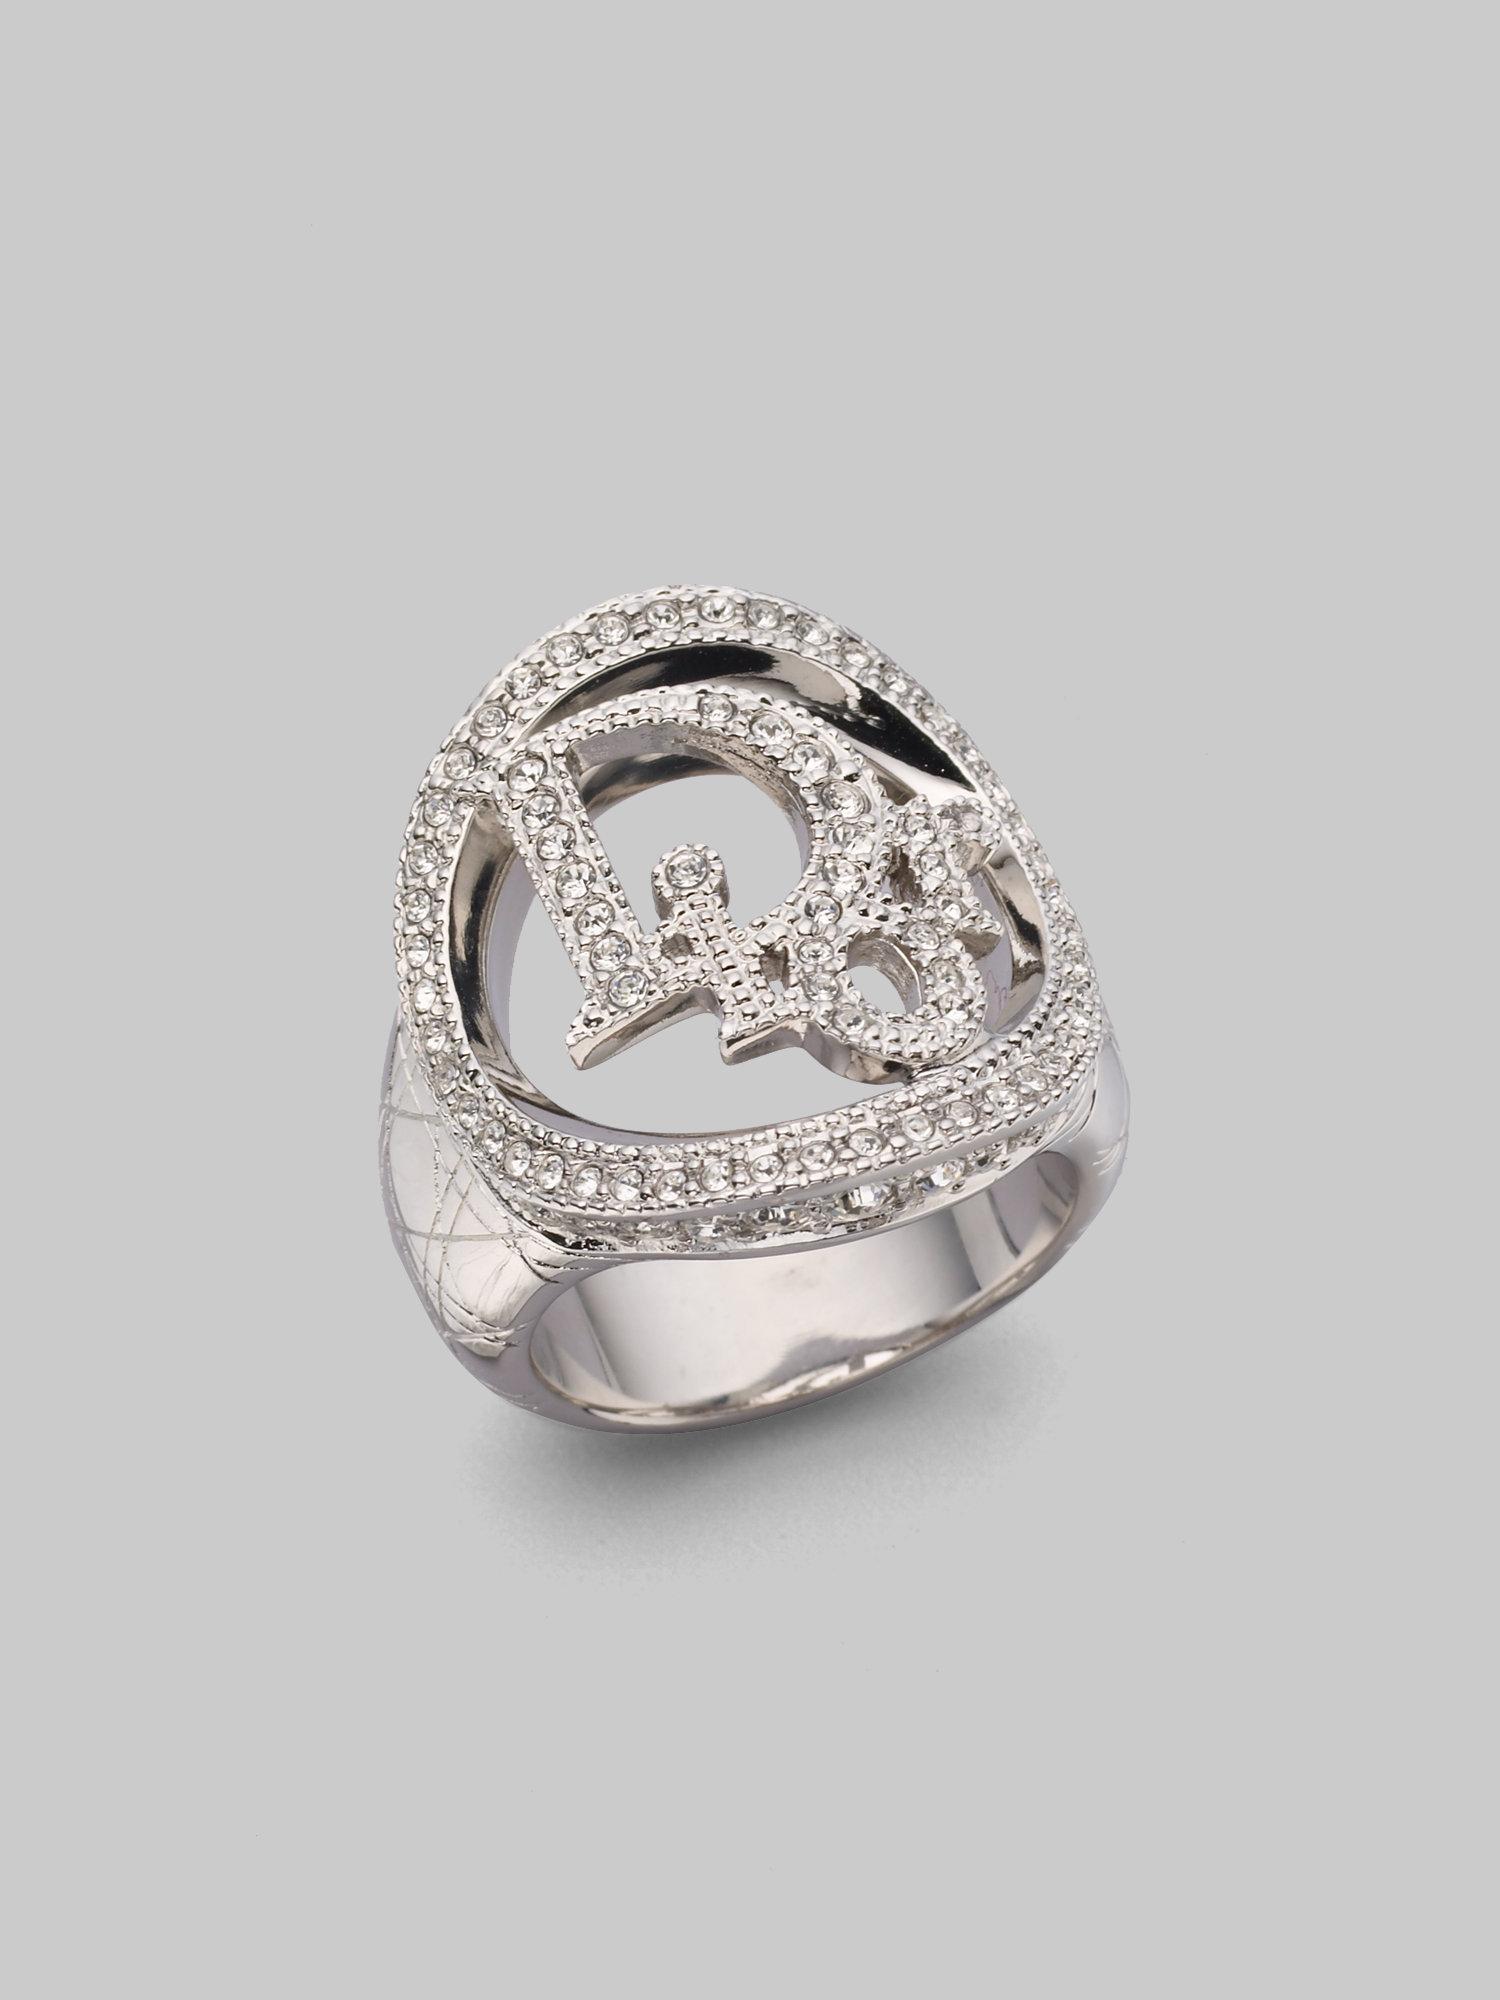 Lyst - Dior Cannage Logo Ring in Metallic